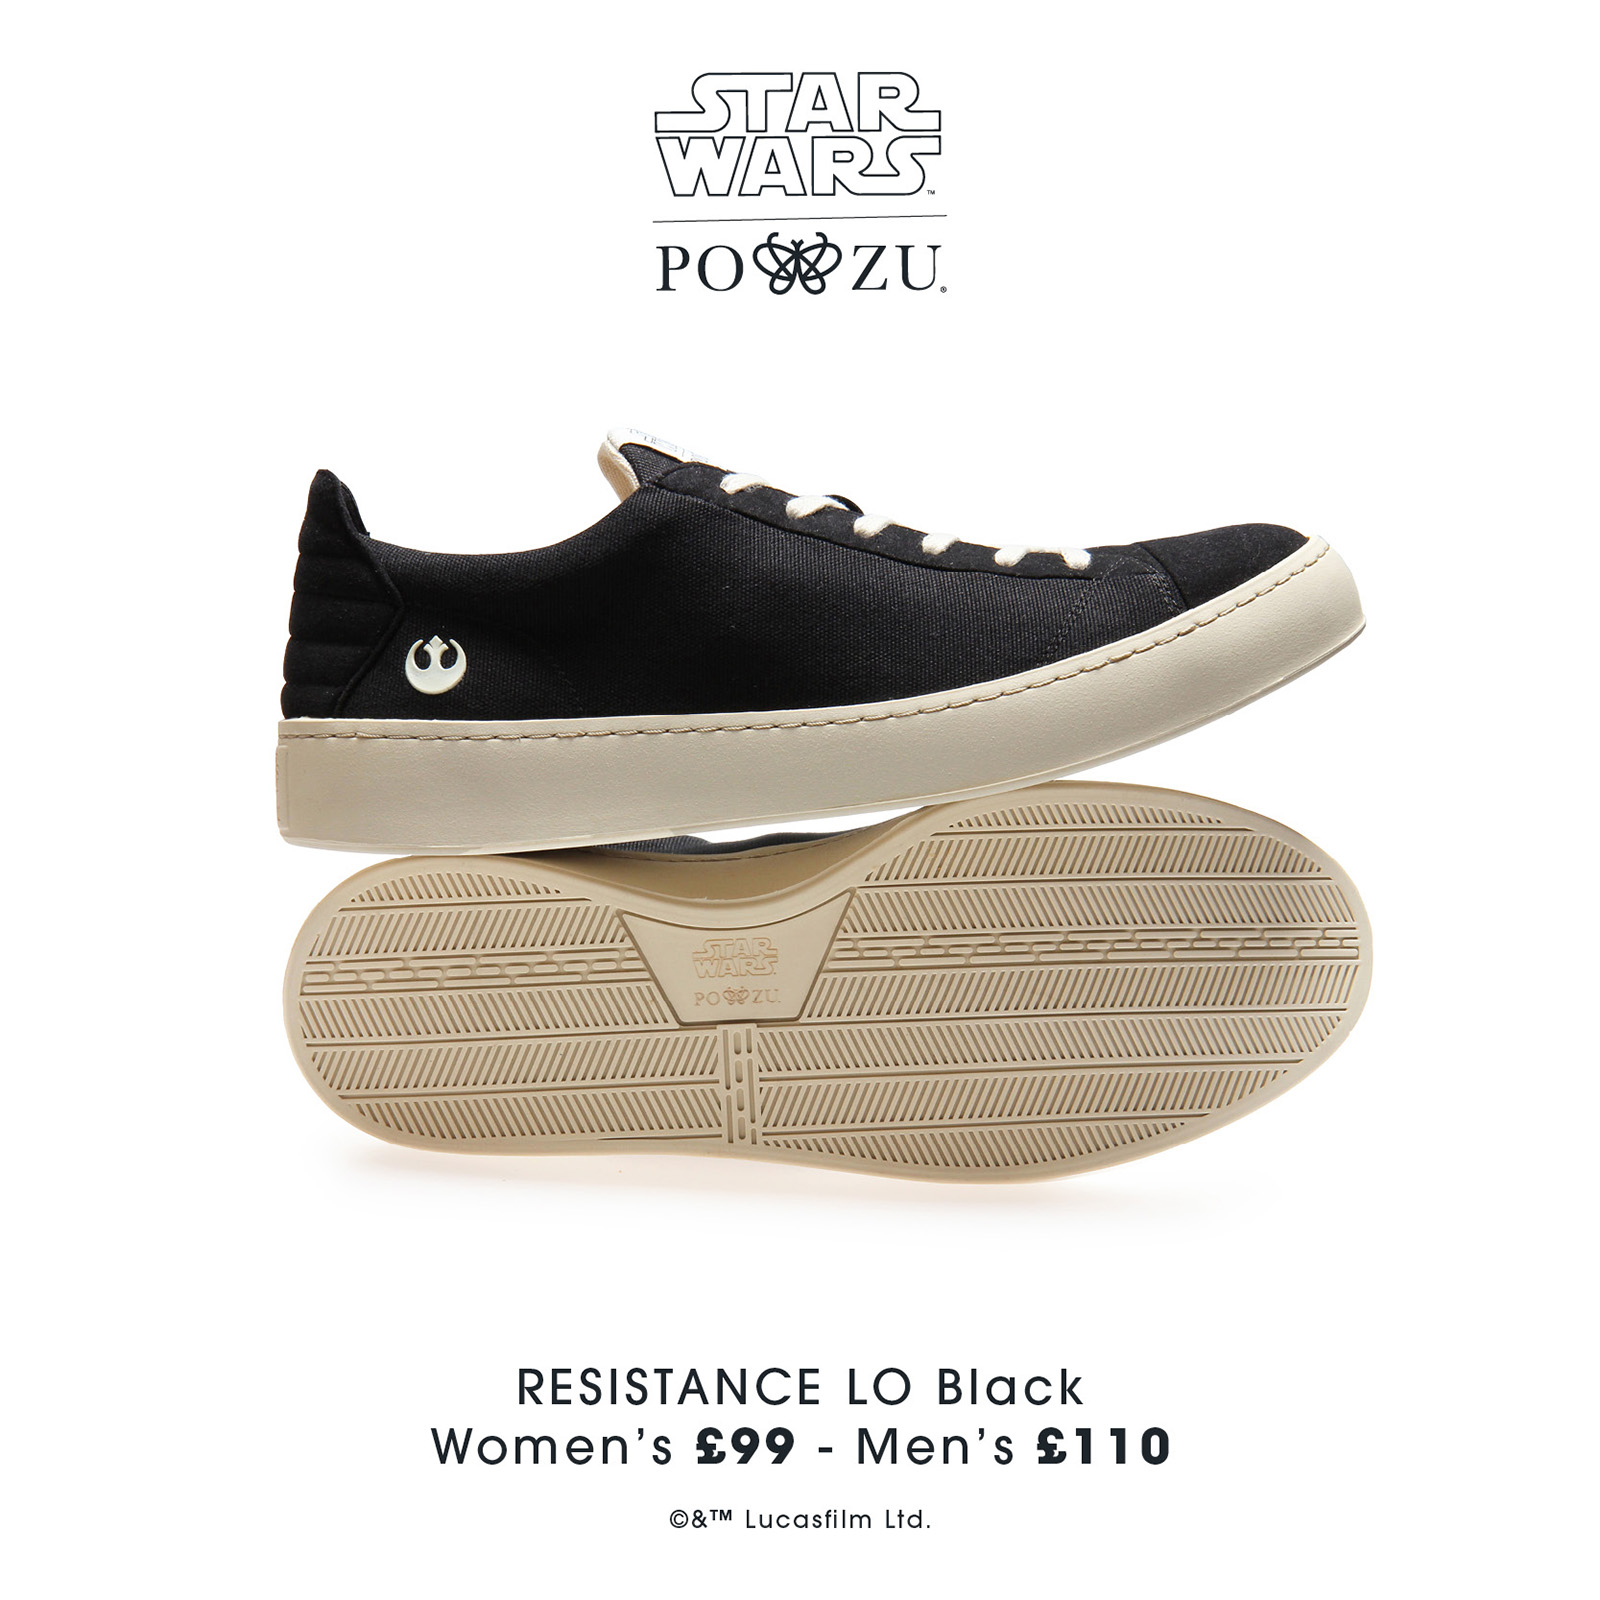 e8d74eae7f BRAND NEW Star Wars Po-Zu footwear announced – TheForceGuide.com